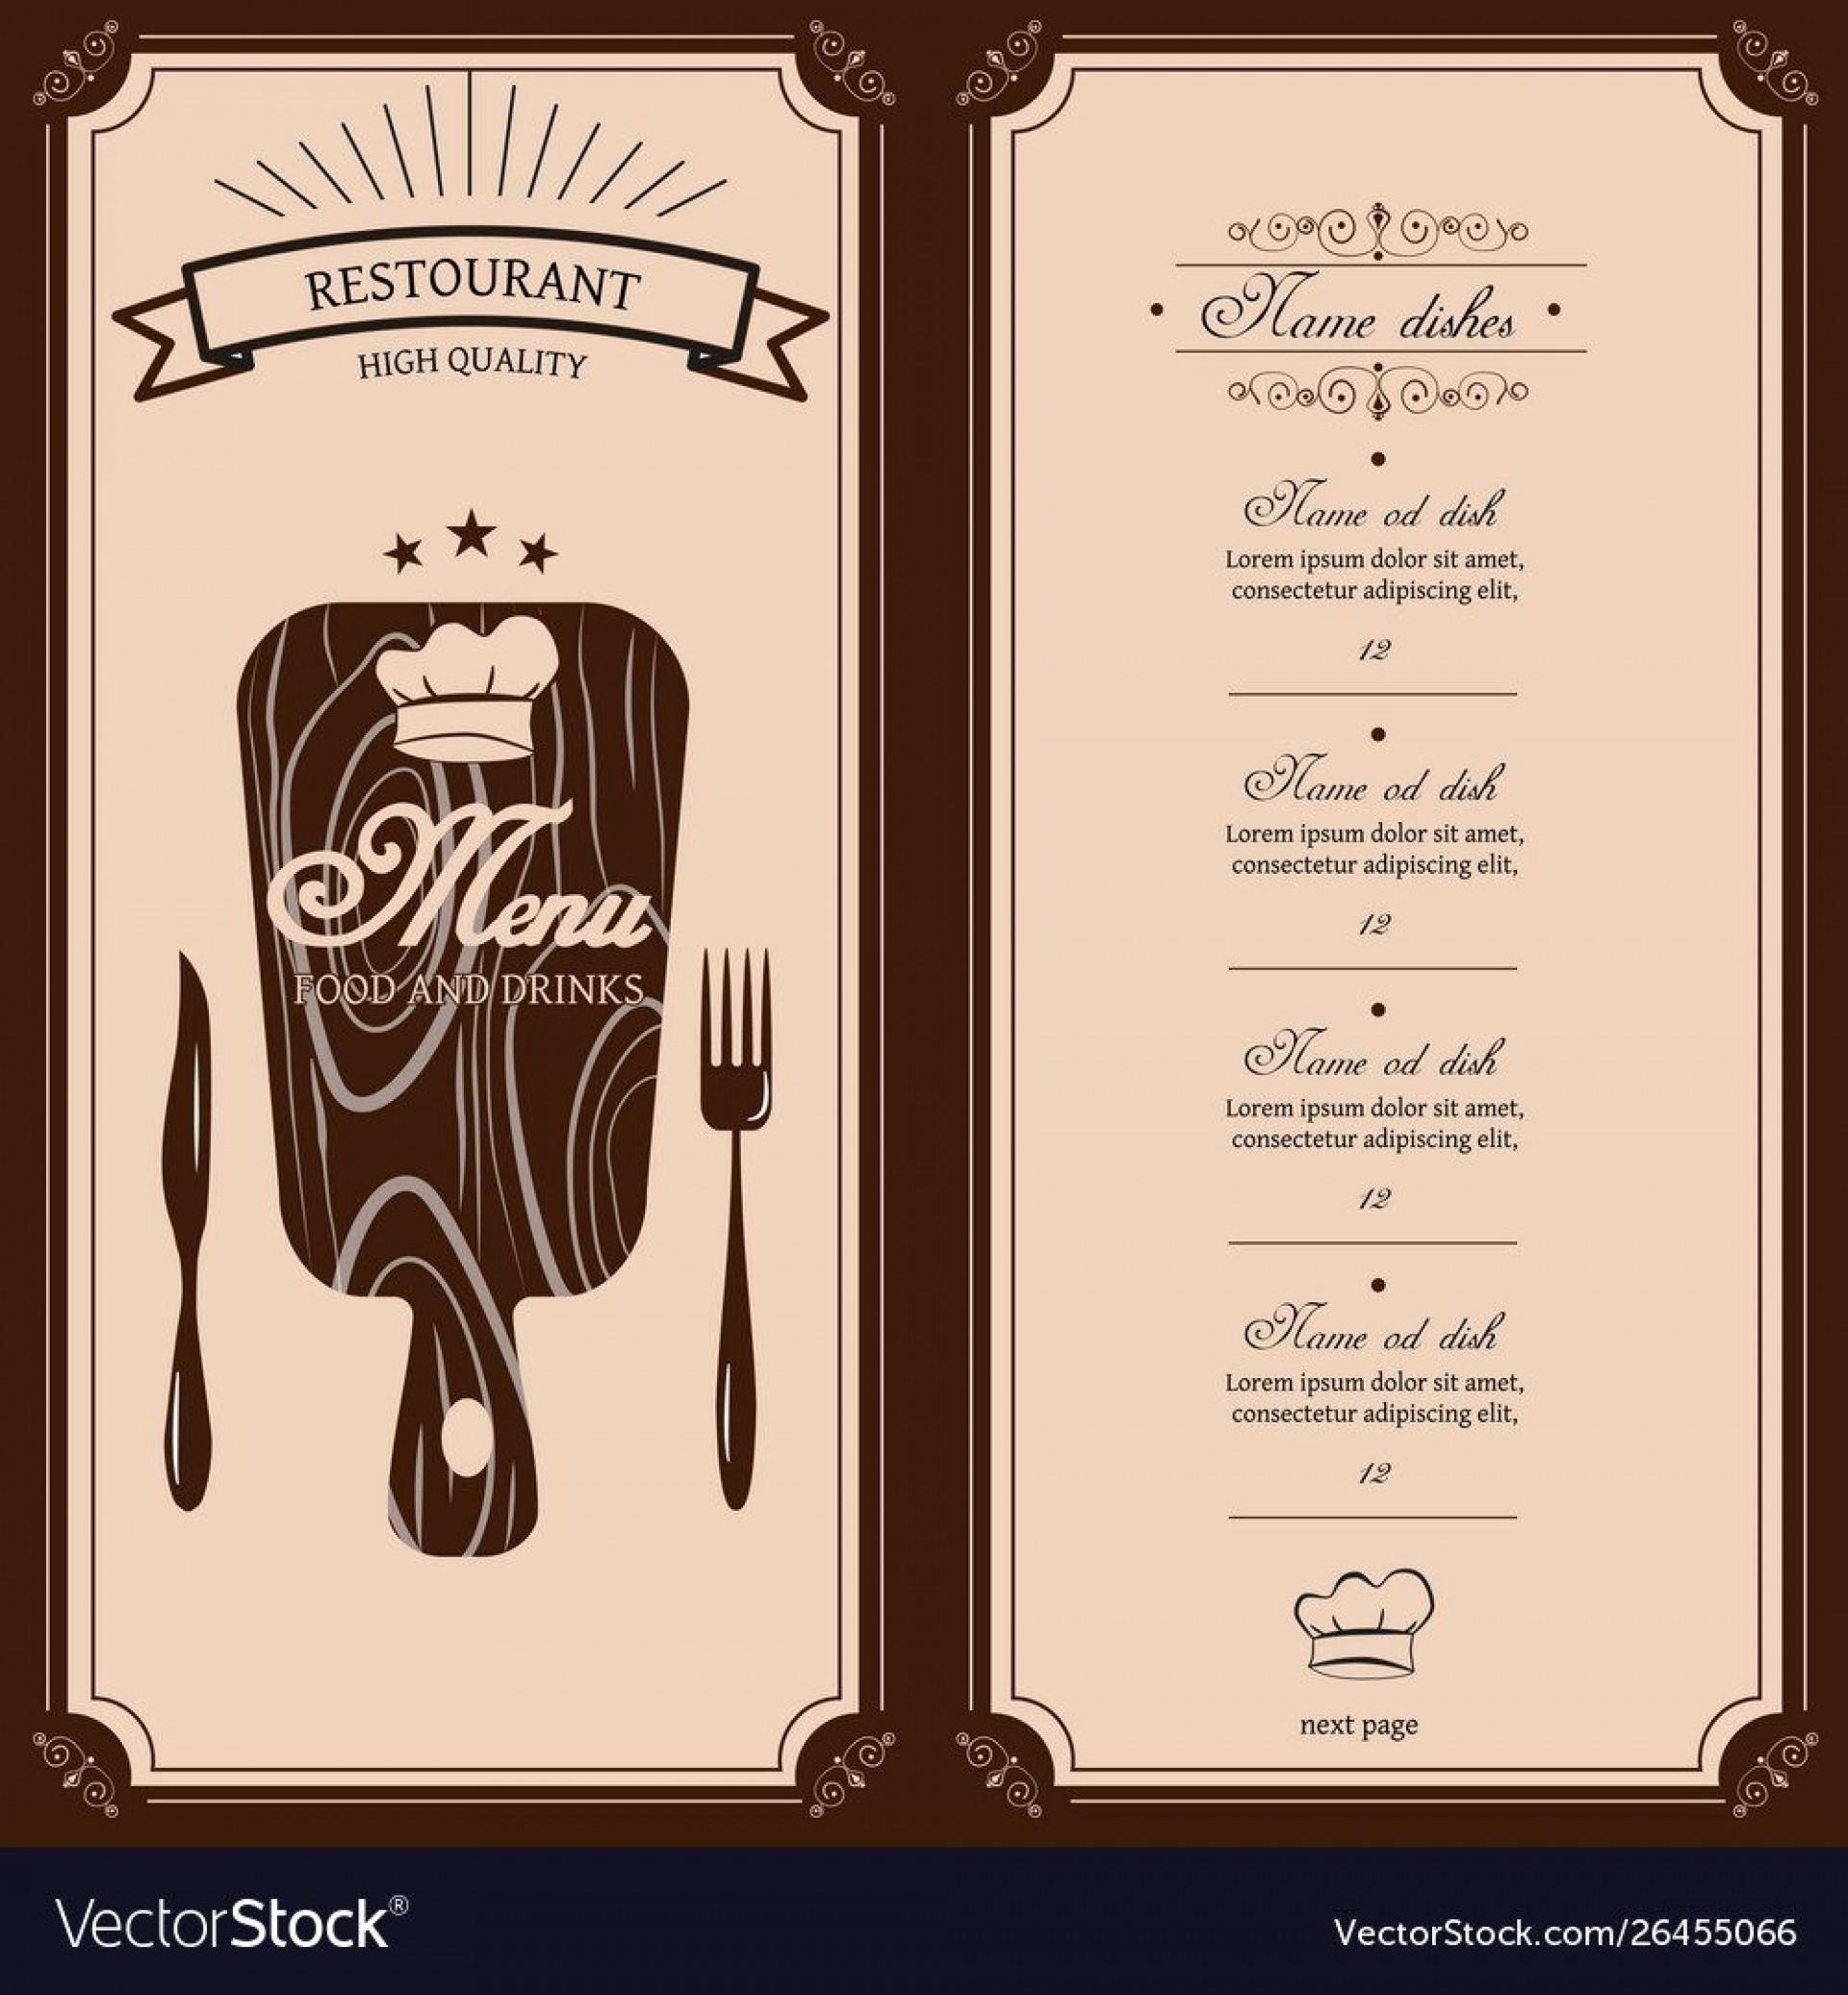 009 Dreaded Restaurant Menu Template Free Idea  Card Download Indesign Word1920